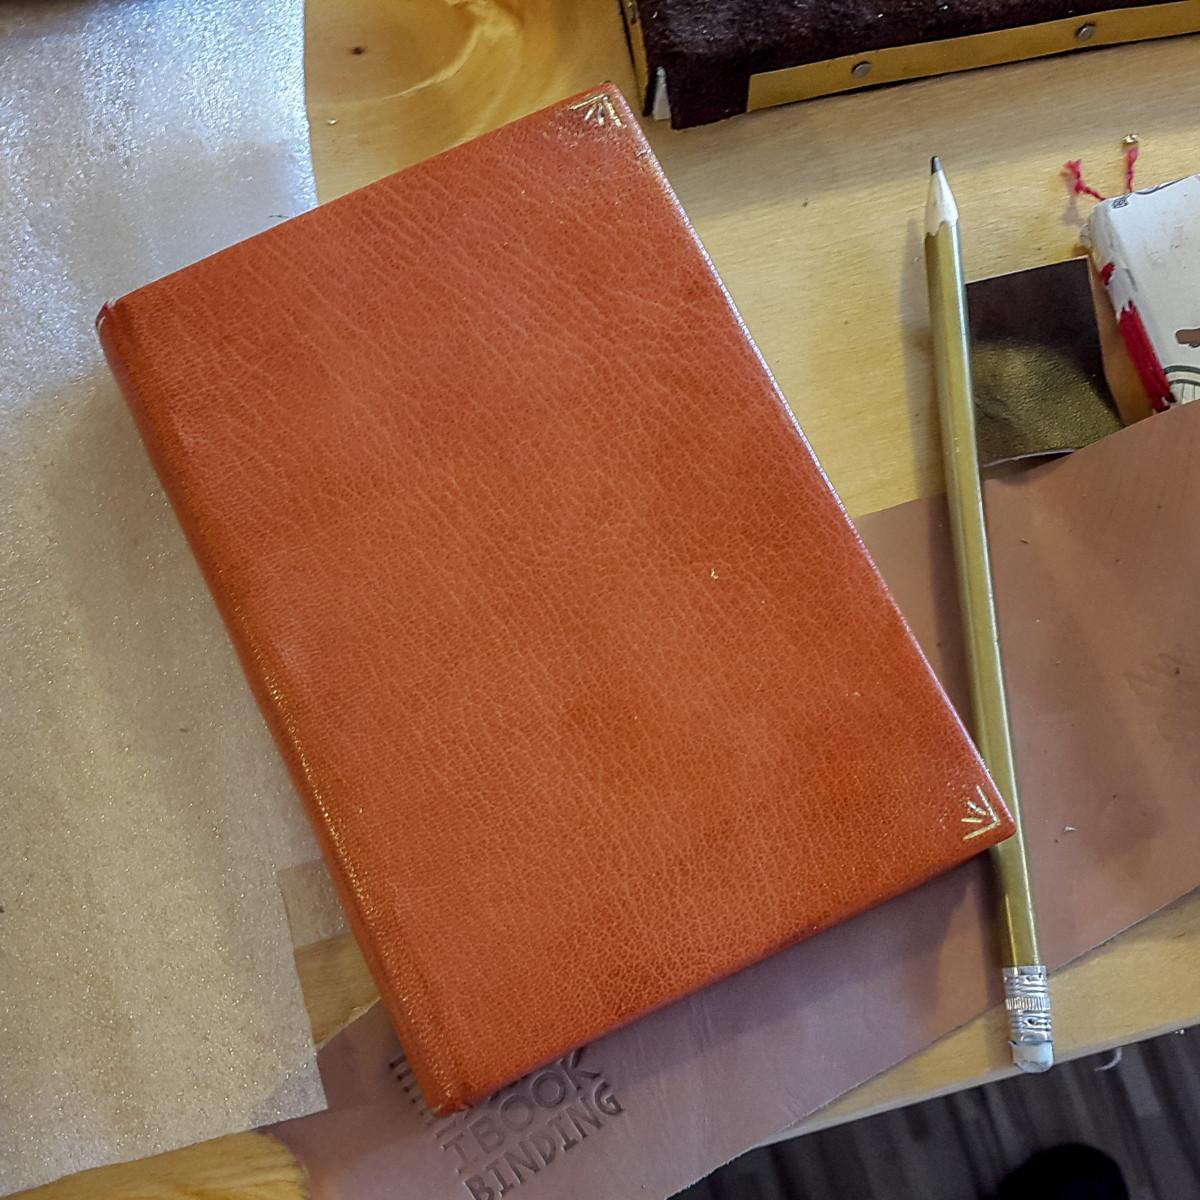 2017.03.28 - Gold Tooling Workshop - Bookbinding 17